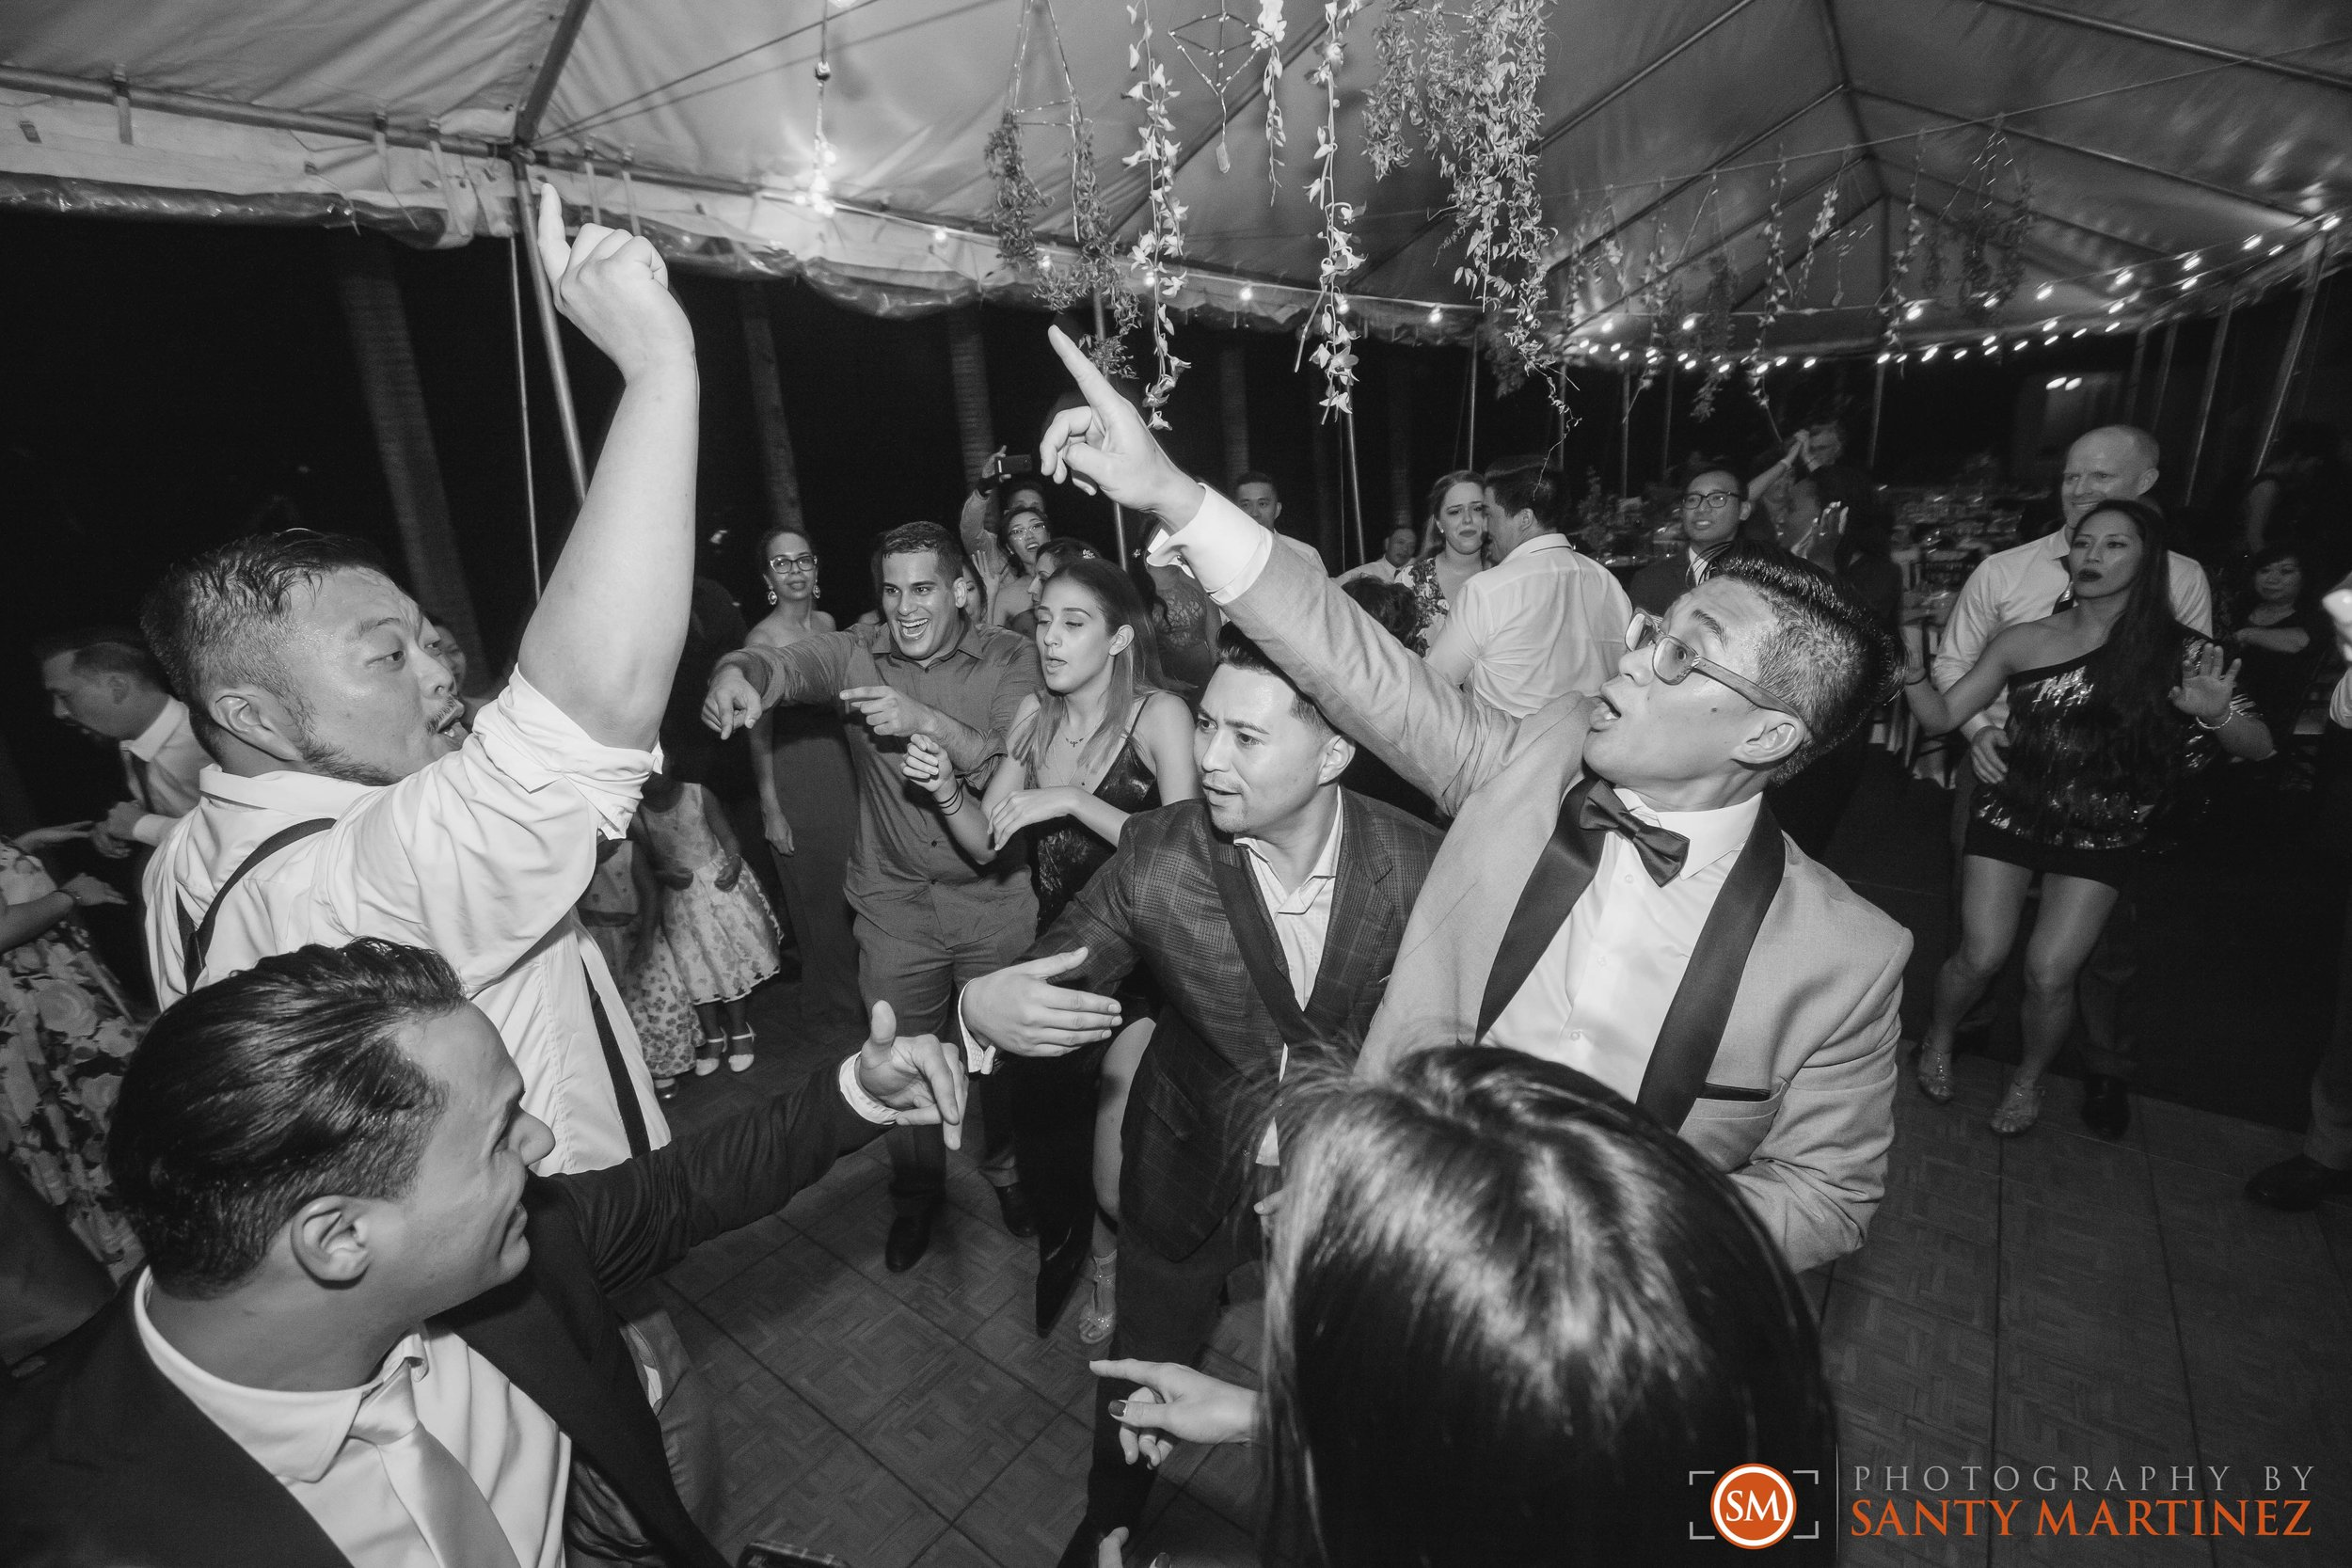 Wedding Bonnet House - Photography by Santy Martinez-45.jpg